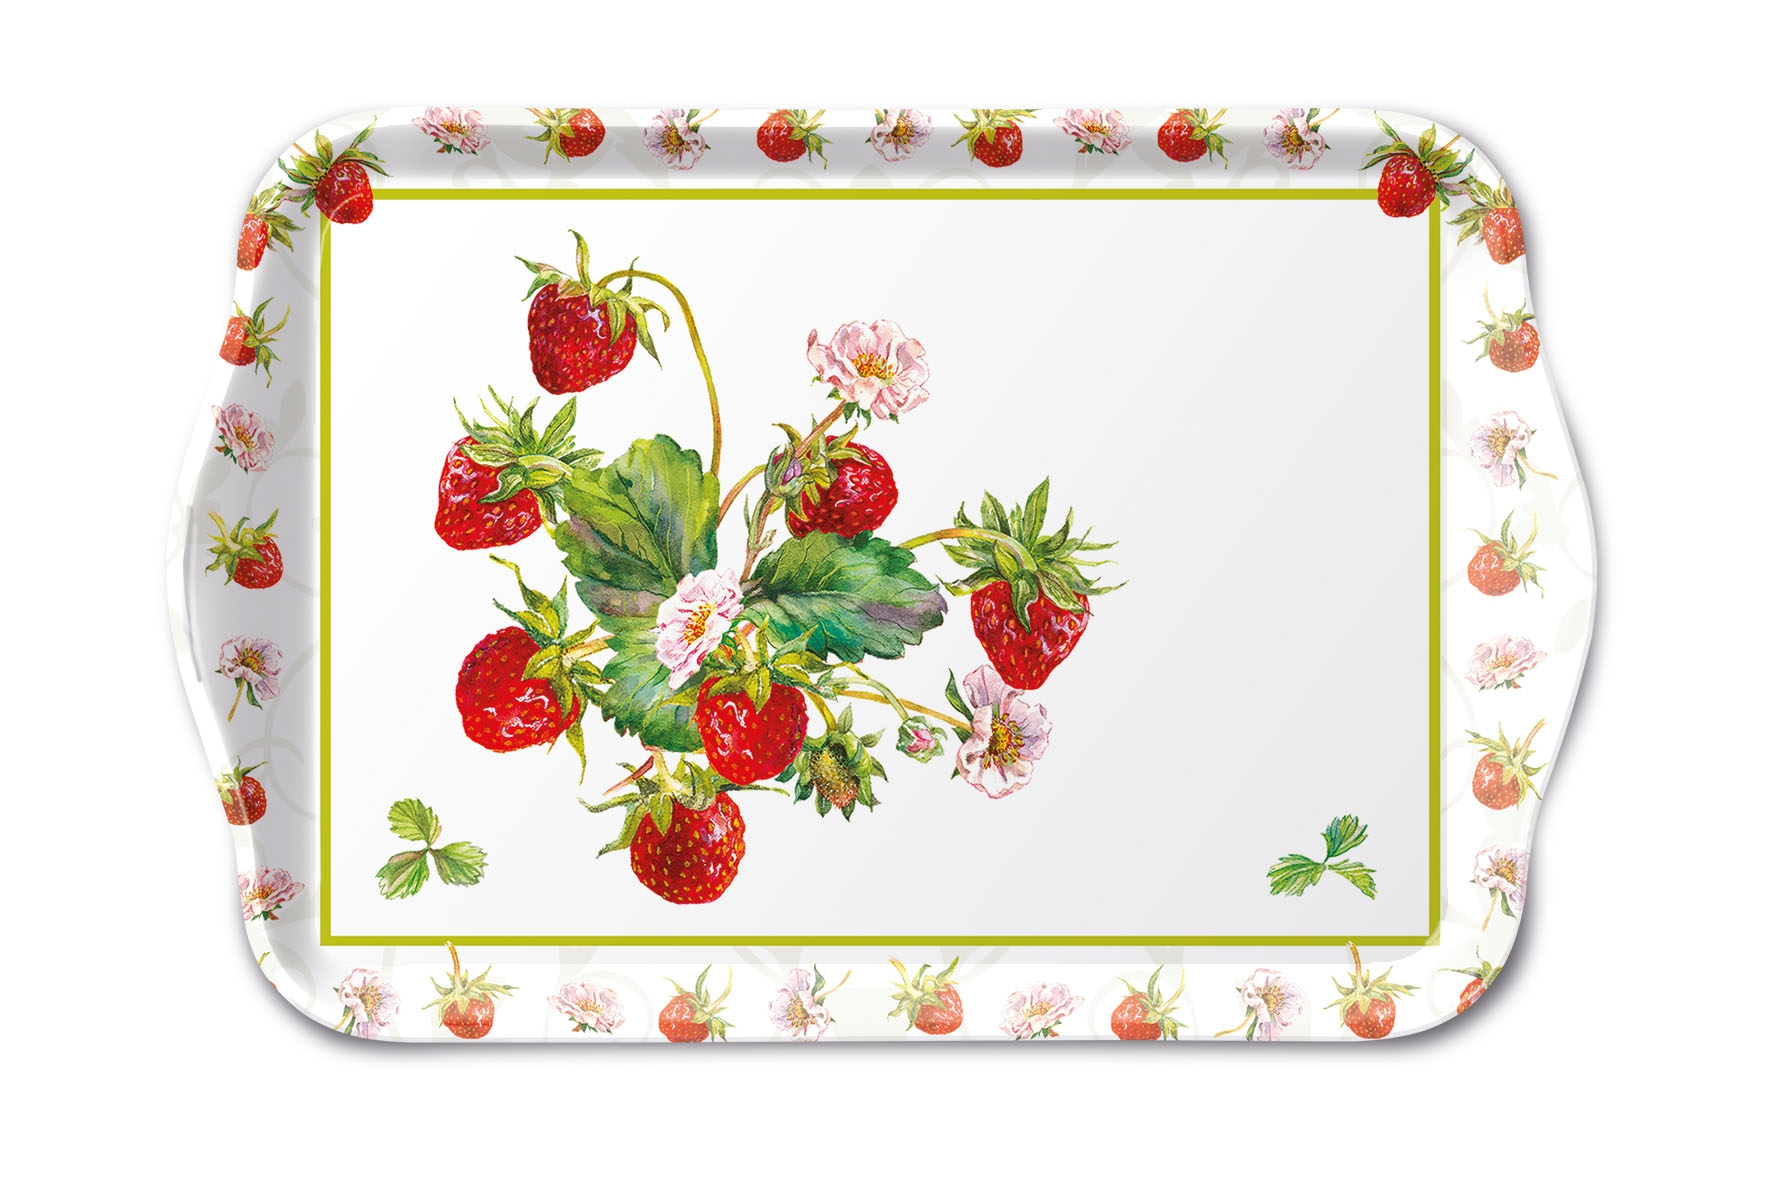 tray - Fresh Strawberries